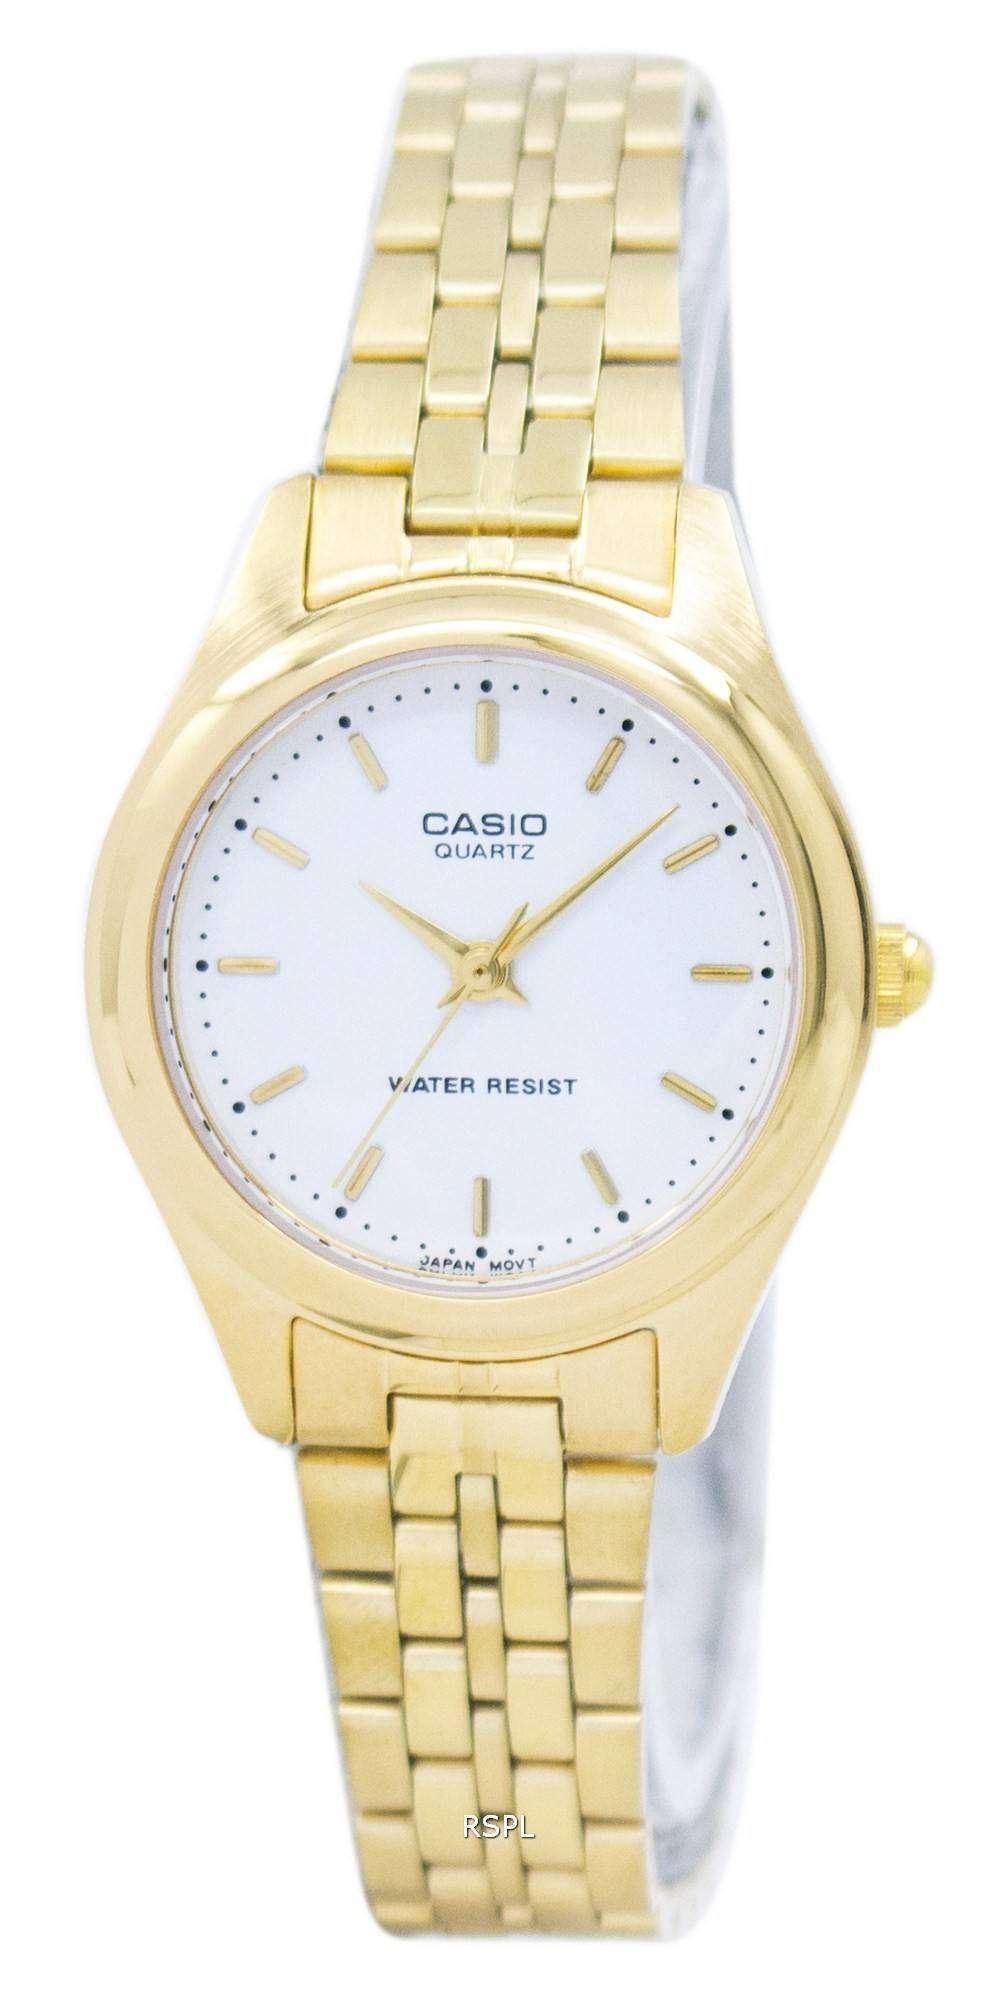 9083e66ba7b Casio Analog Quartz LTP-1129N-7A LTP1129N-7A Women s Watch